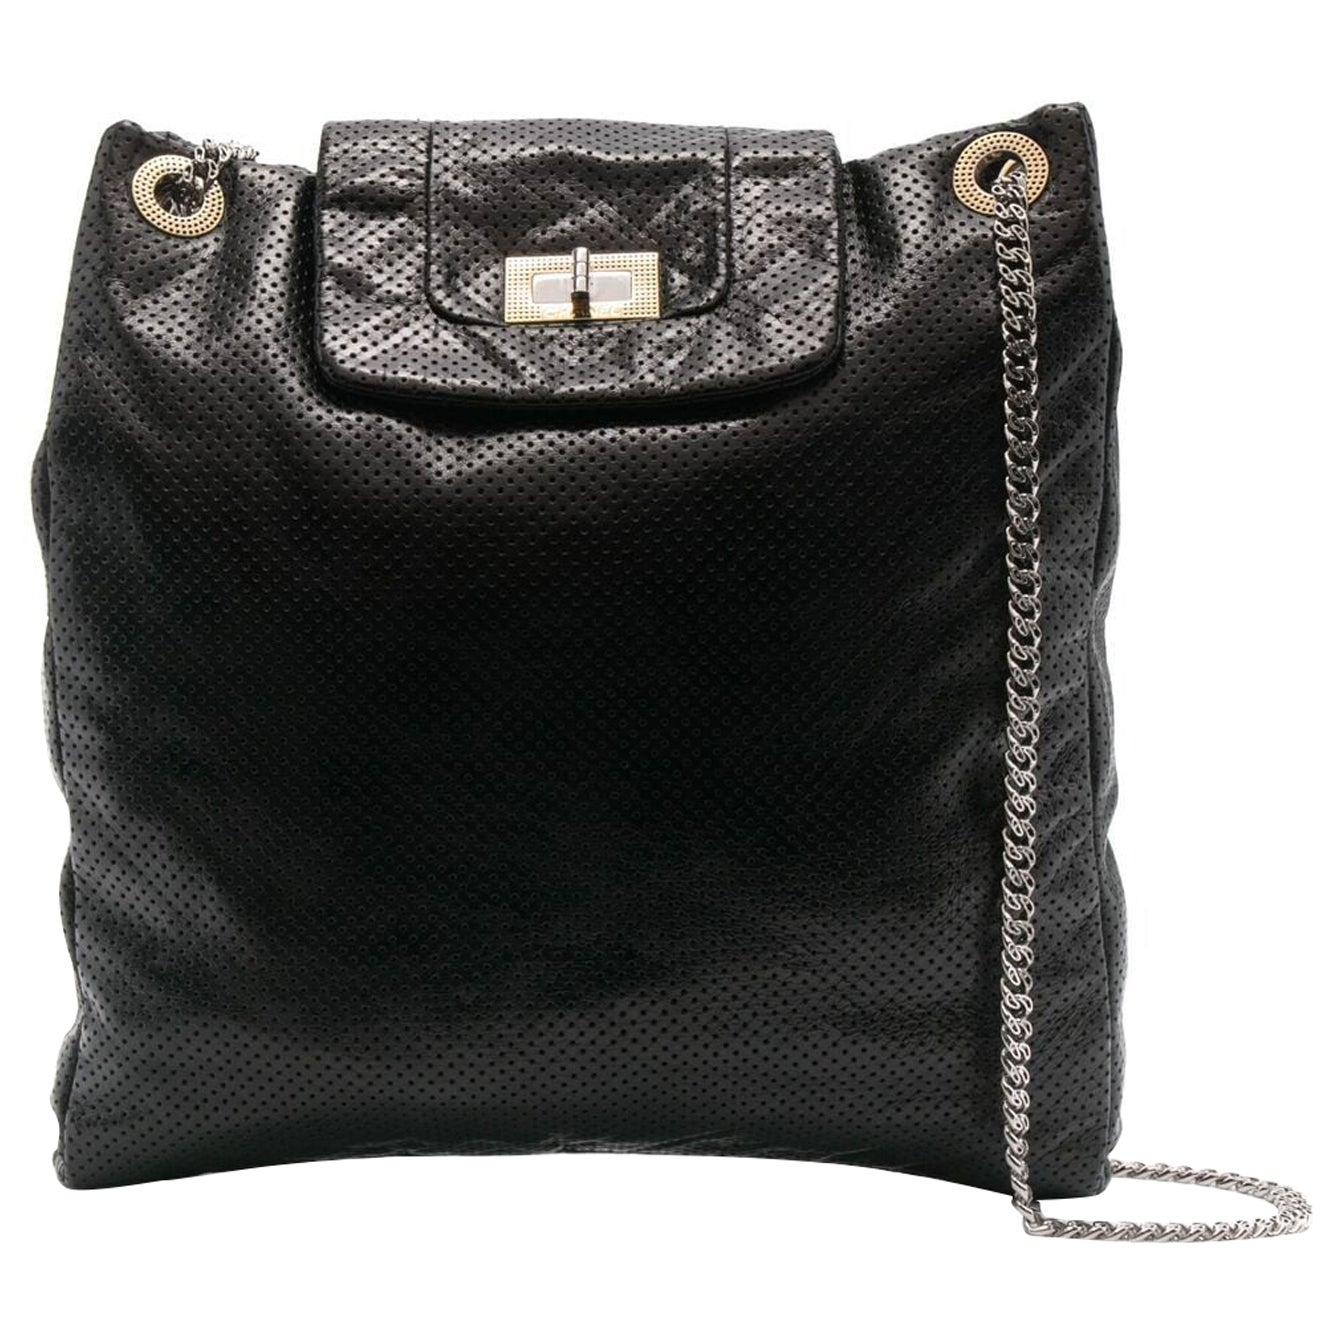 2008 Chanel Black Perforated Leather Shoulder Tote Bag